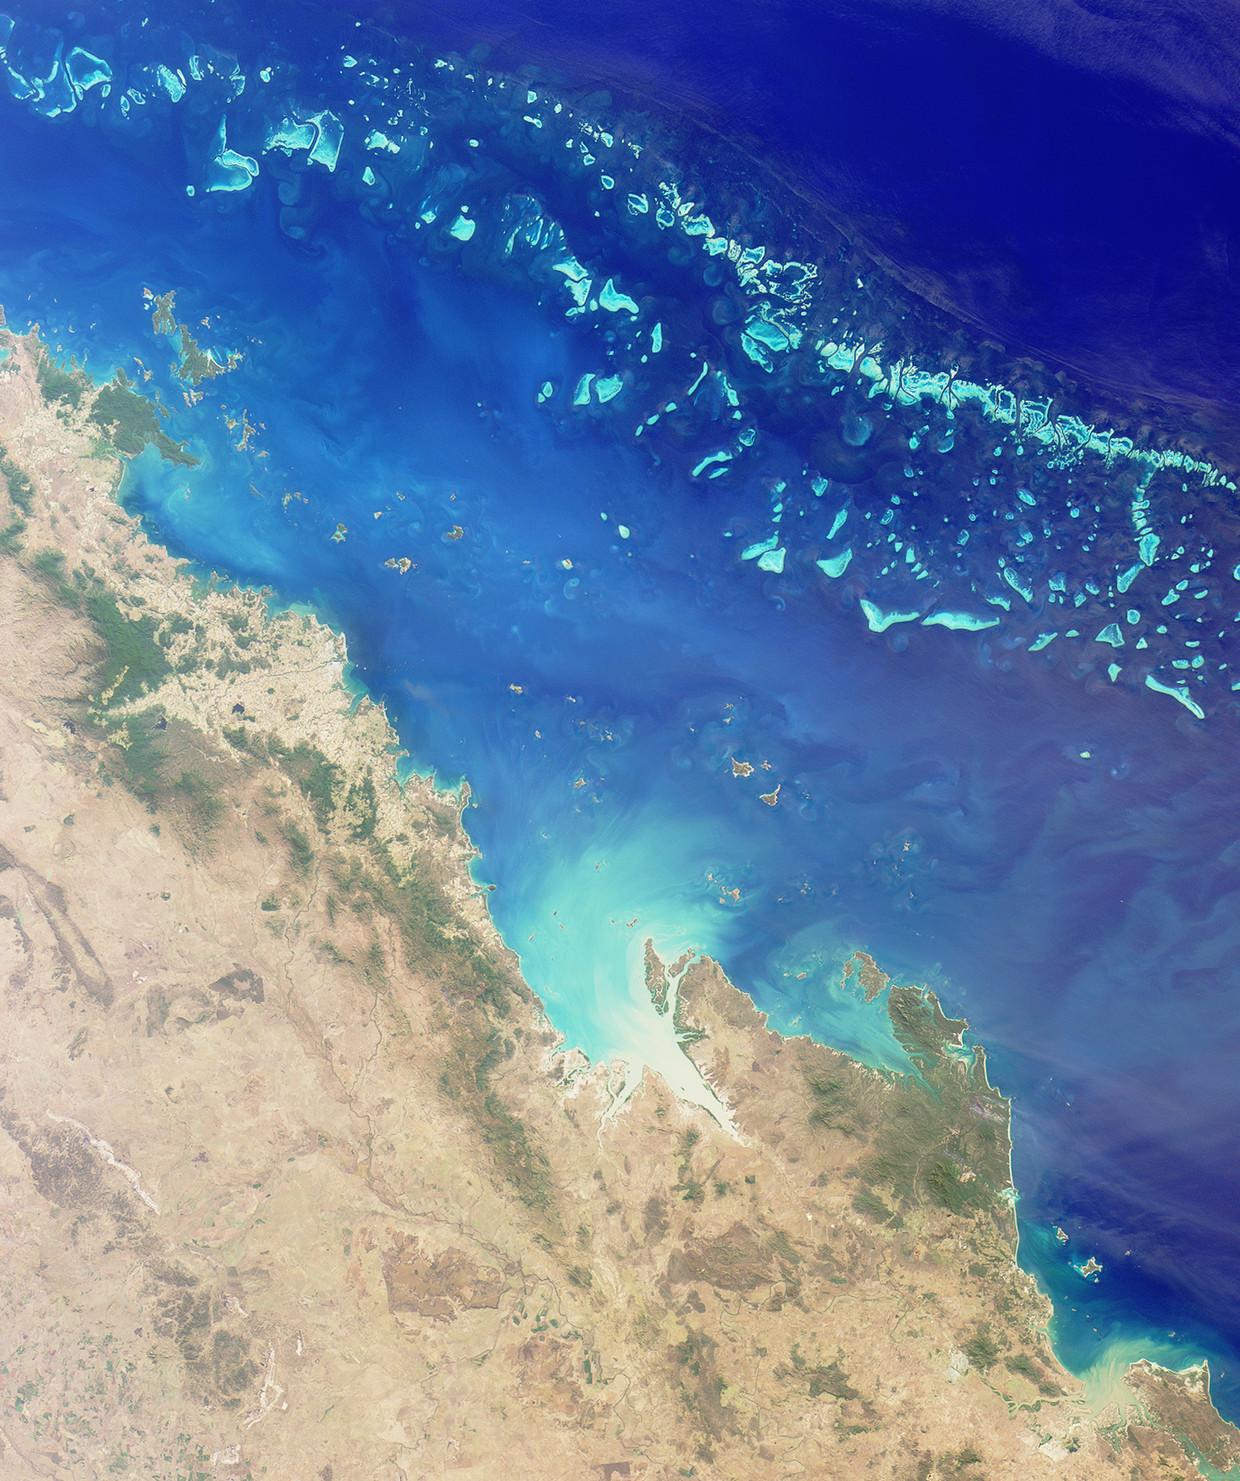 Groot Barrièrerif bij Australië.